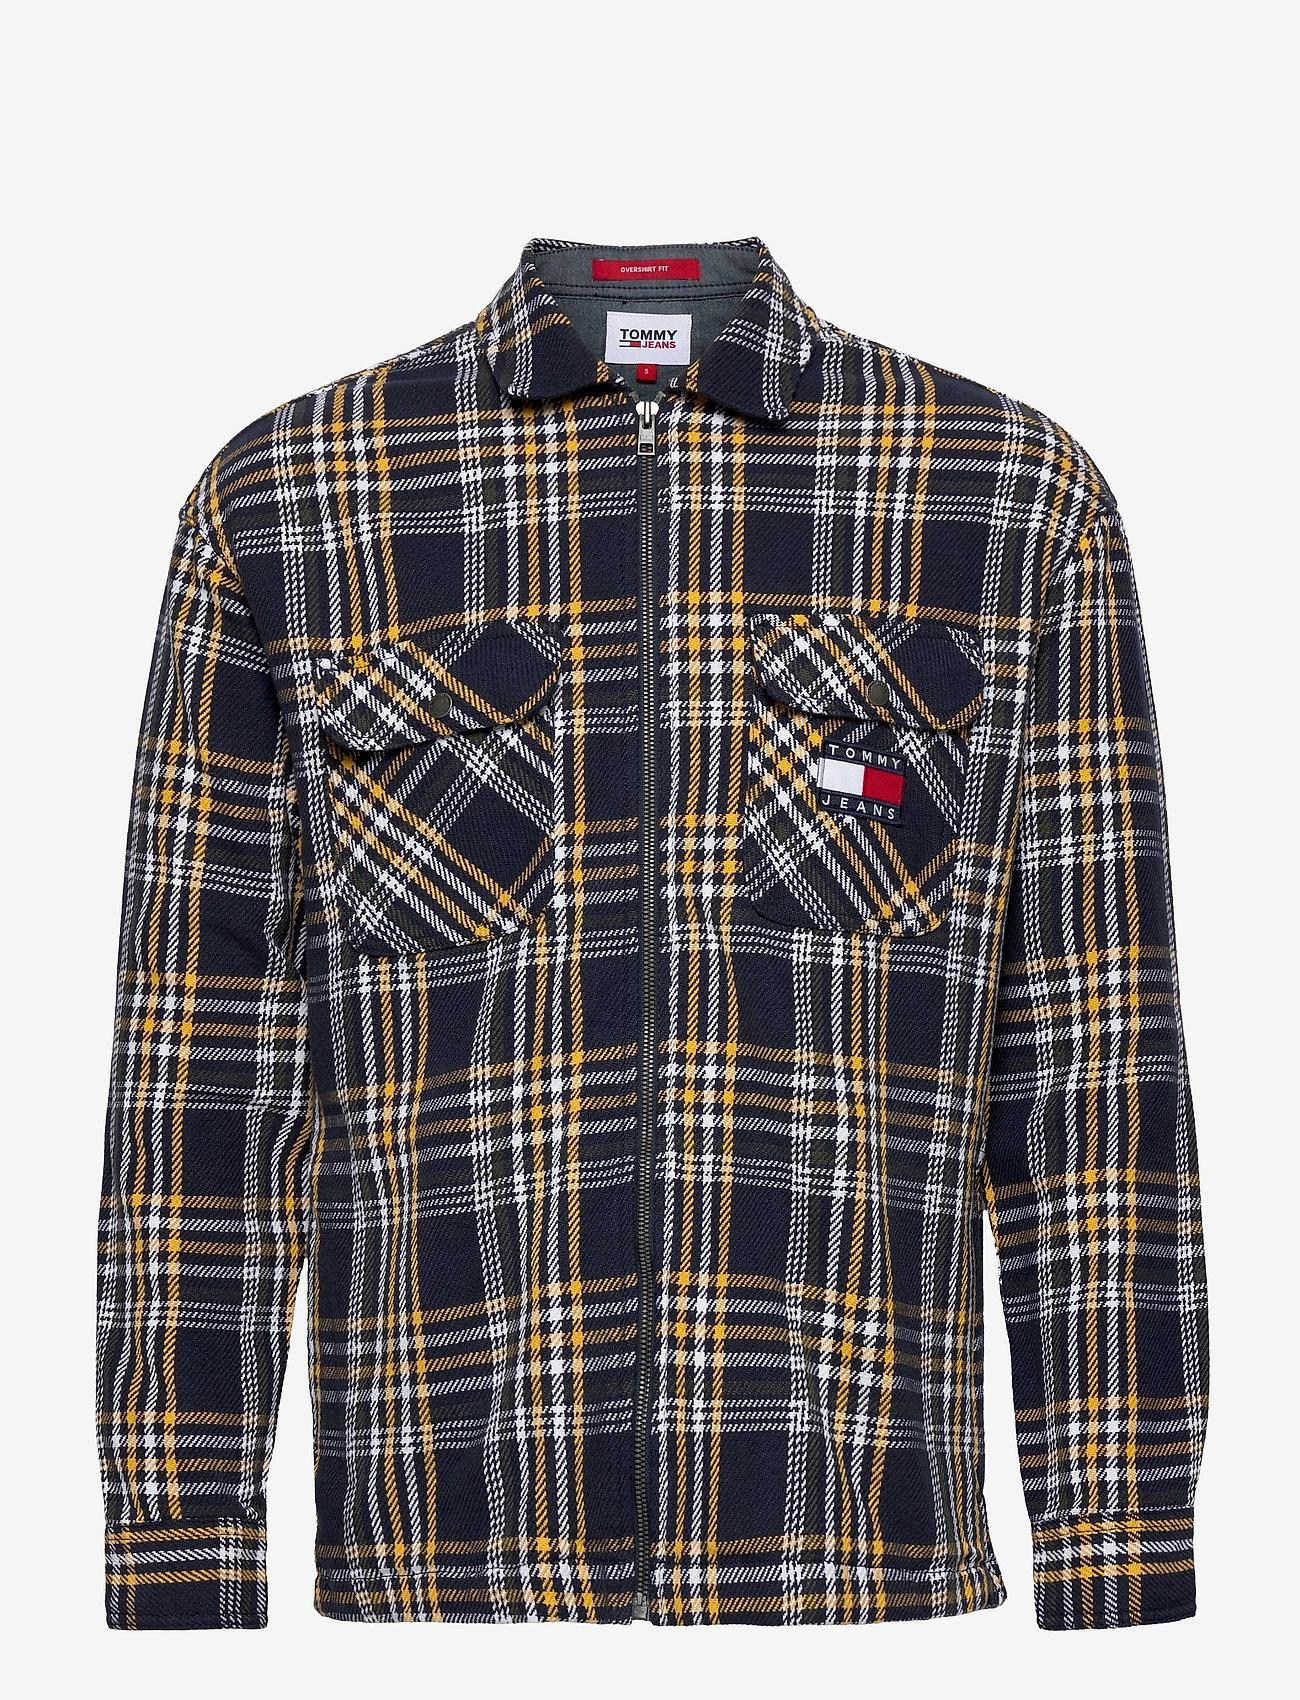 Tommy Jeans - TJM CHECK ZIP OVERSHIRT - kläder - twilight navy / multi - 0